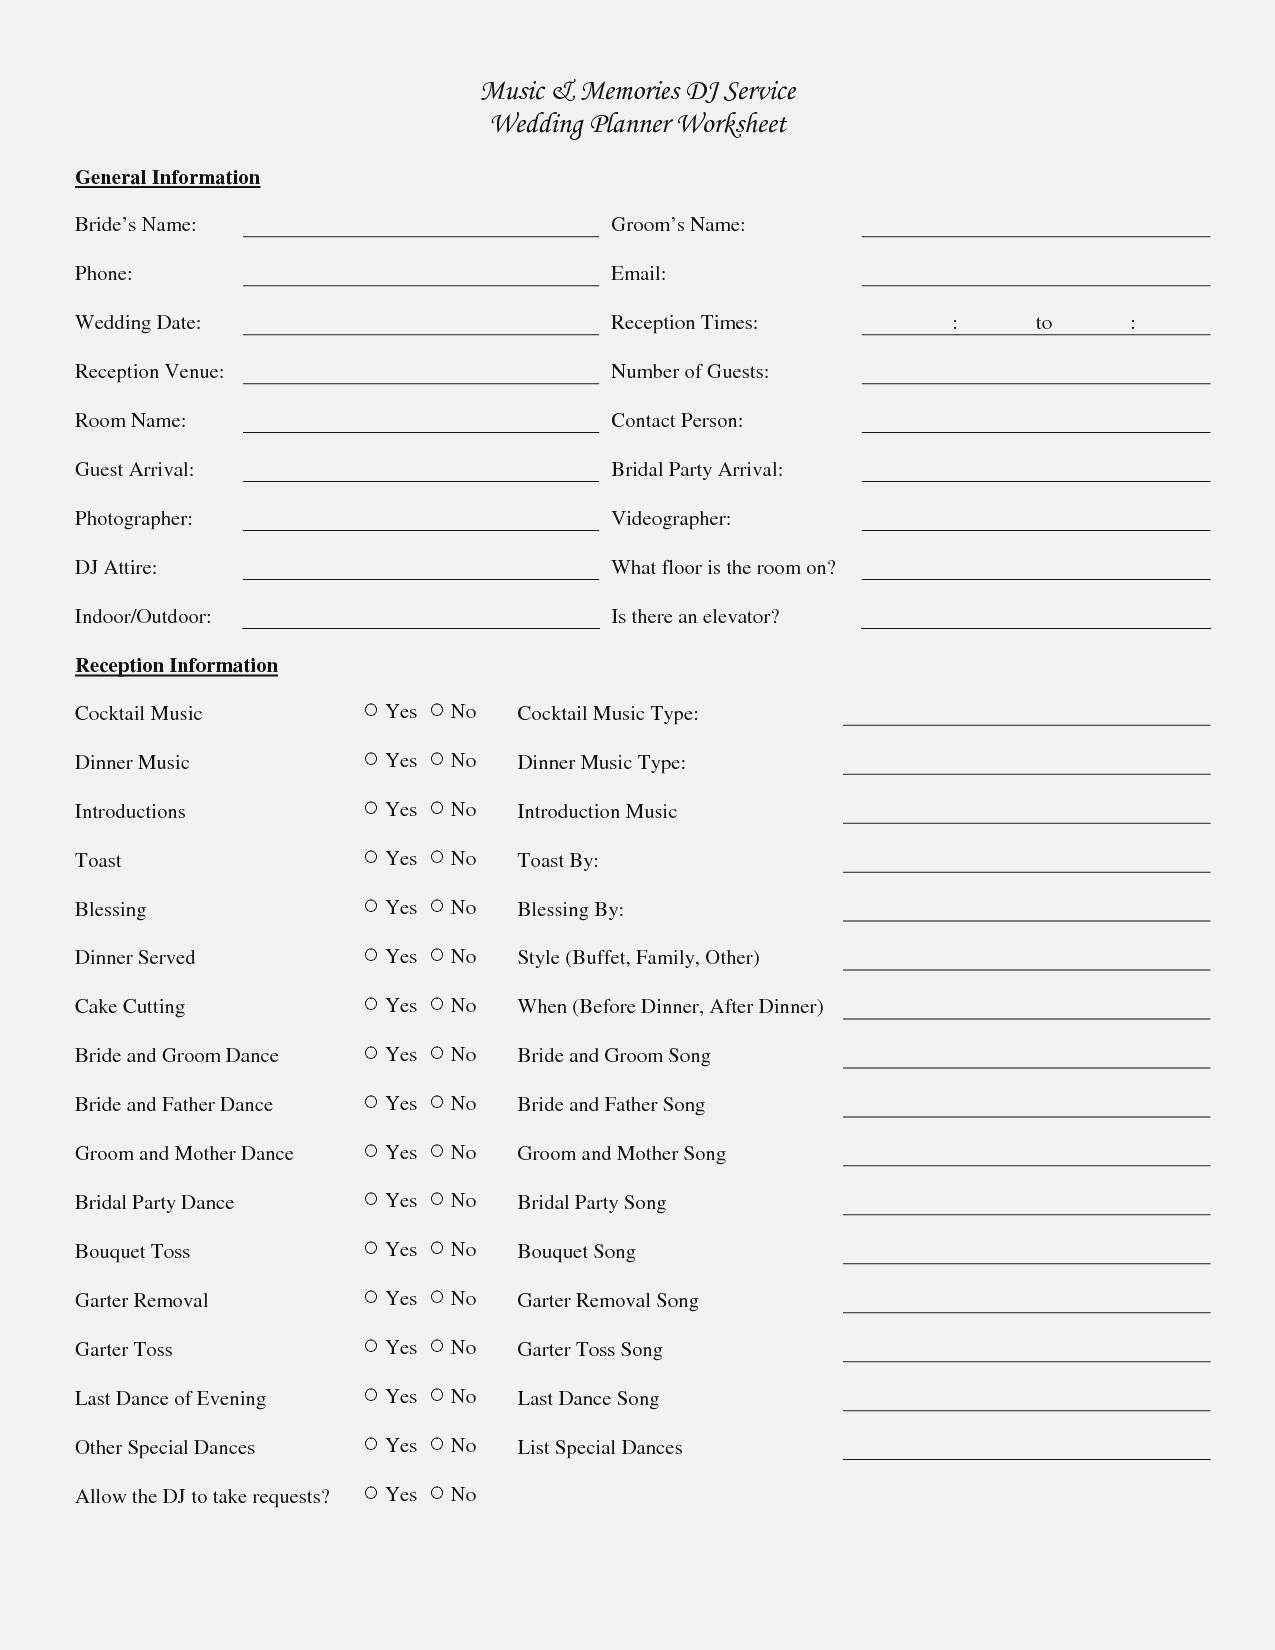 Event Planning Form Template Inspirational Wedding Music Checklist Printable Wedding Planning Worksheet Wedding Reception Timeline Wedding Reception Checklist